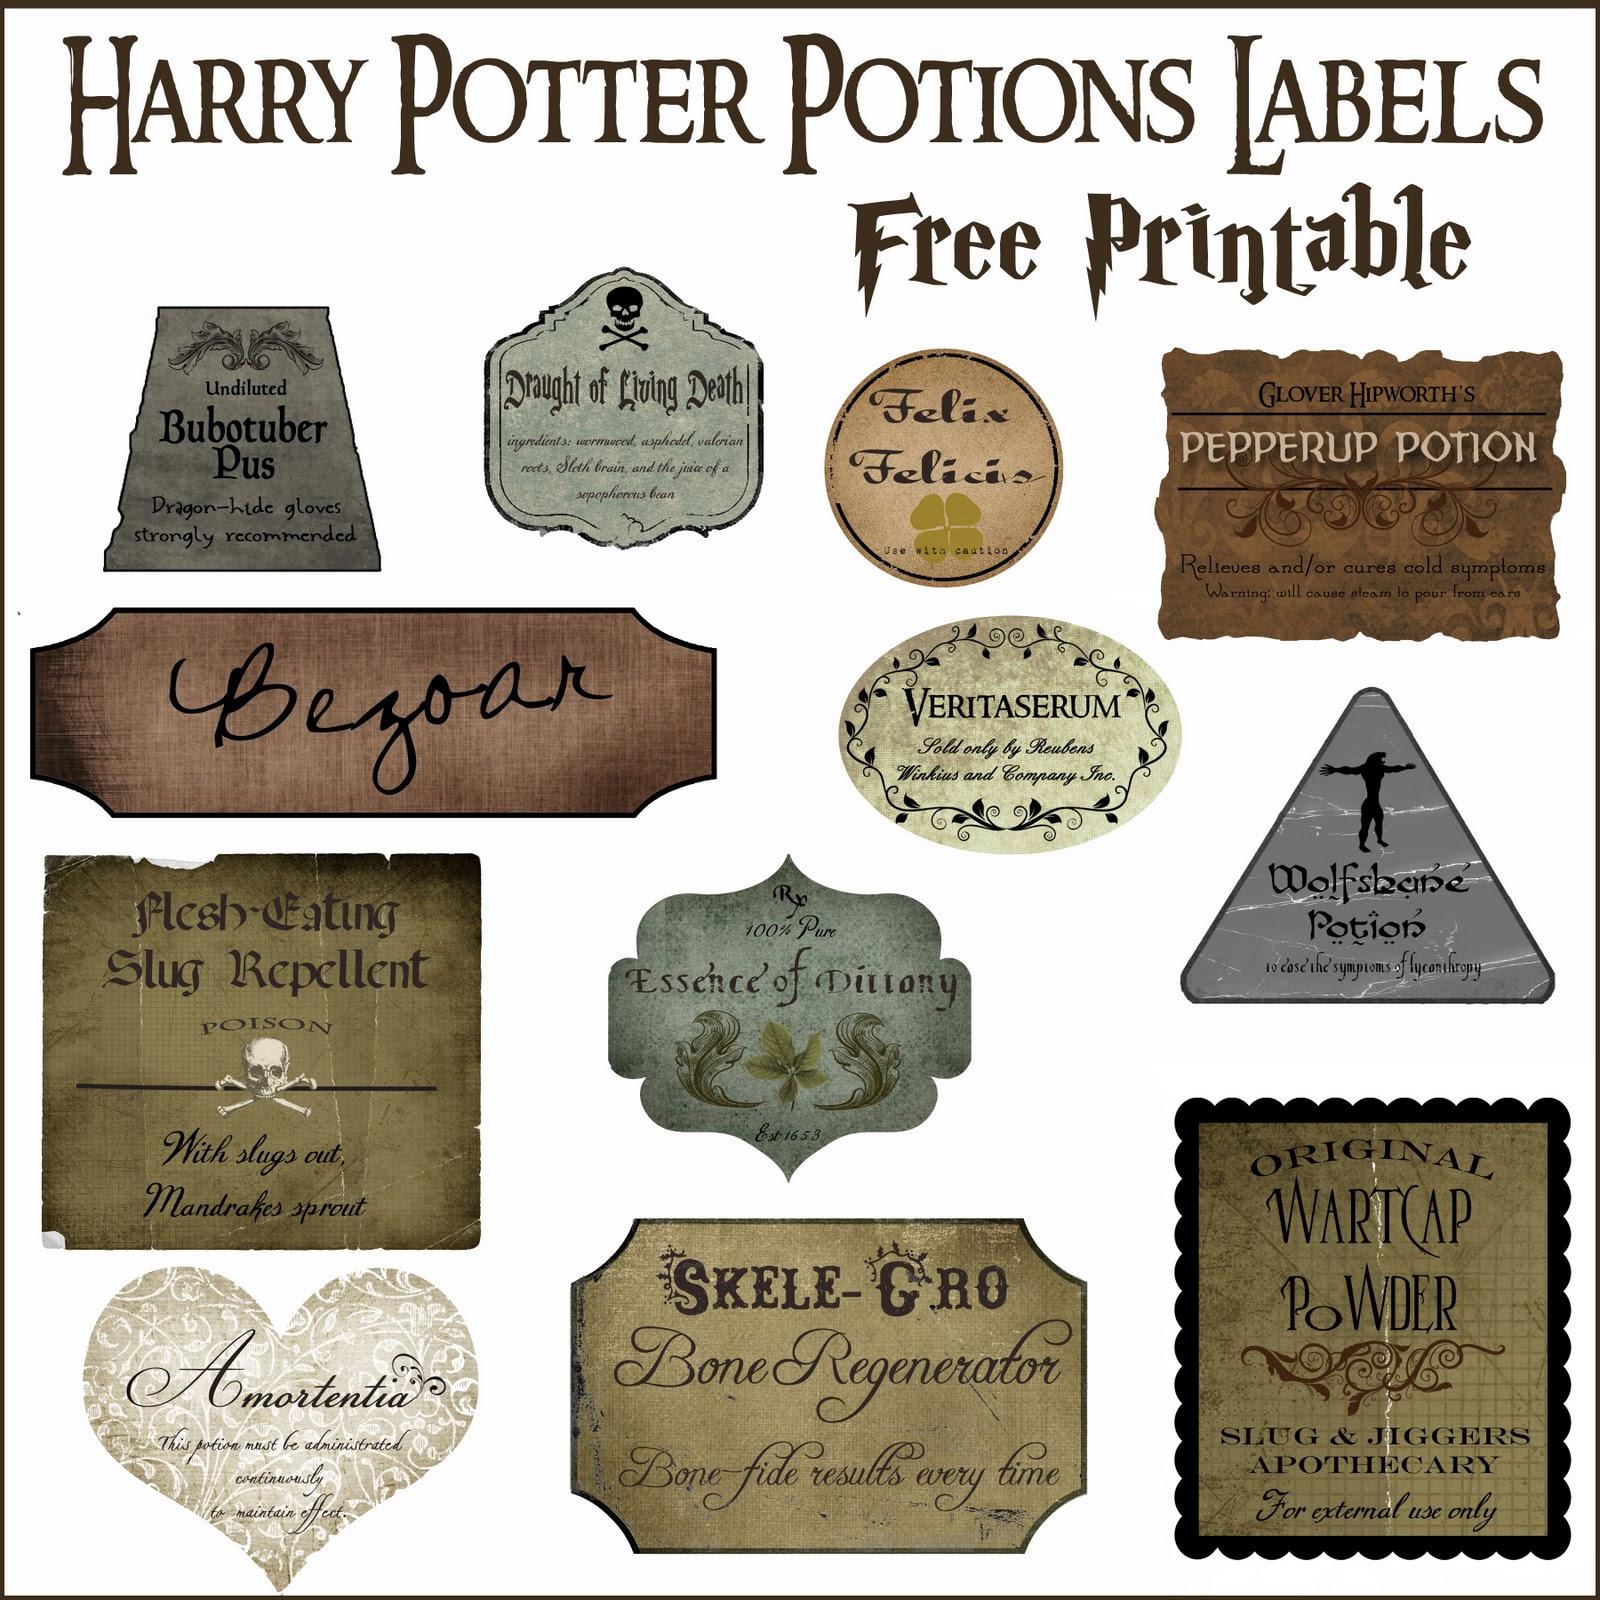 Harry Potter Potion Label Printables - Free Printable Potion Labels